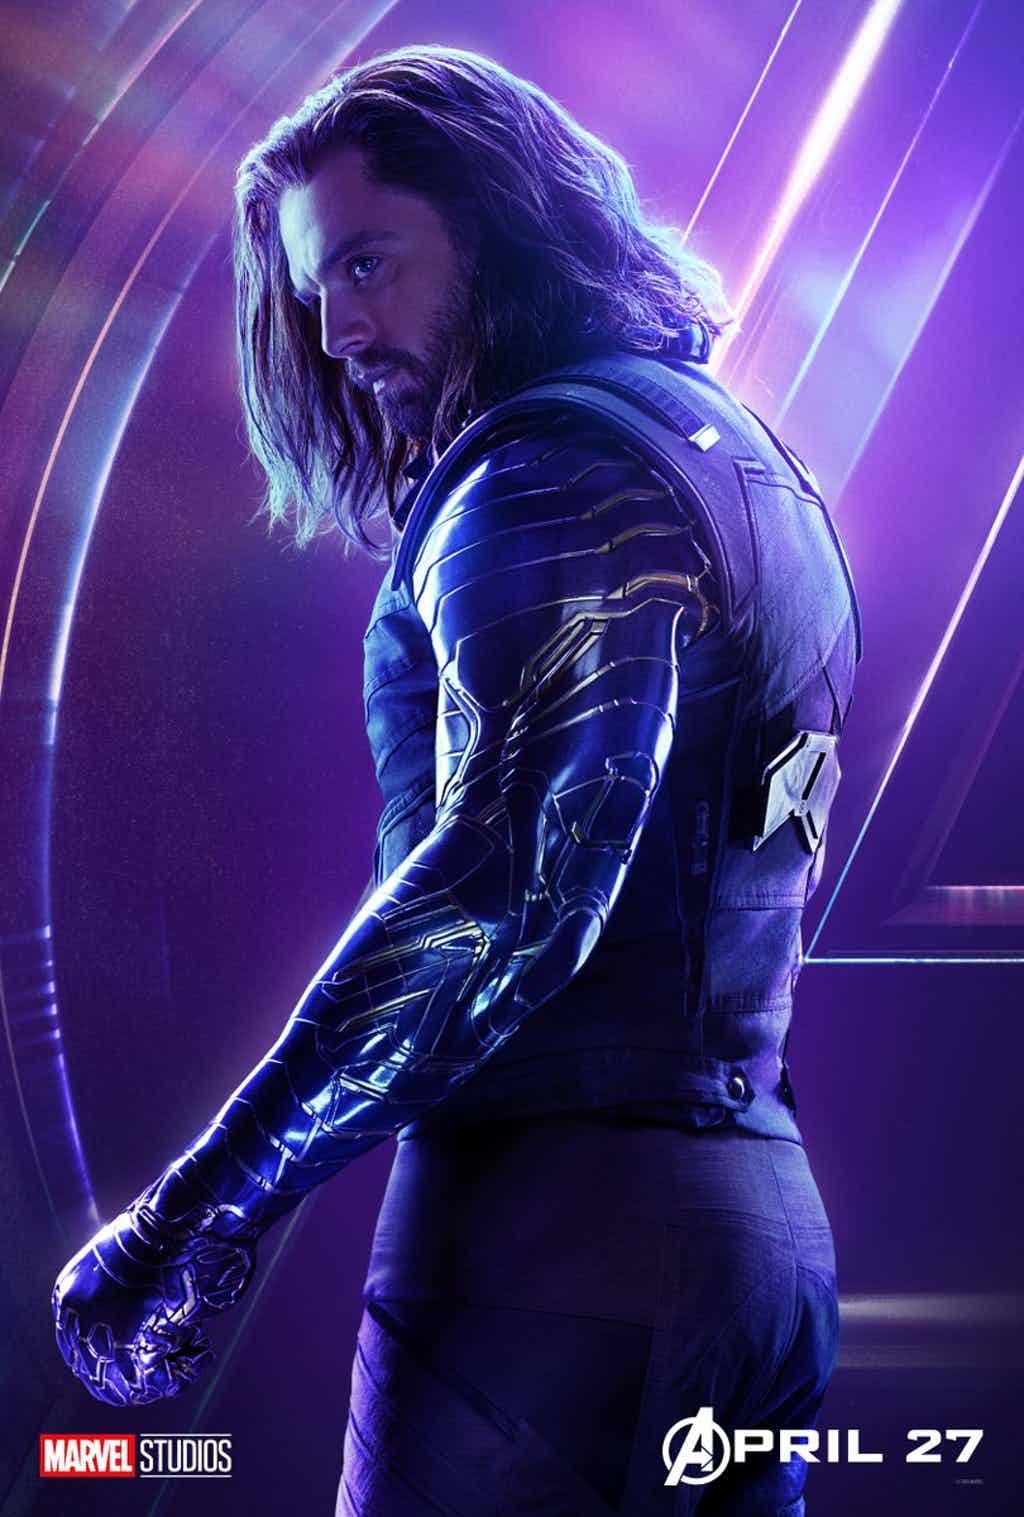 szmk_marvel_infinity_war_vegtelen_haboru_bosszuallok_avengers_ironman_hulk_thor_captainamaerica_guardians_galaxy_20.jpg